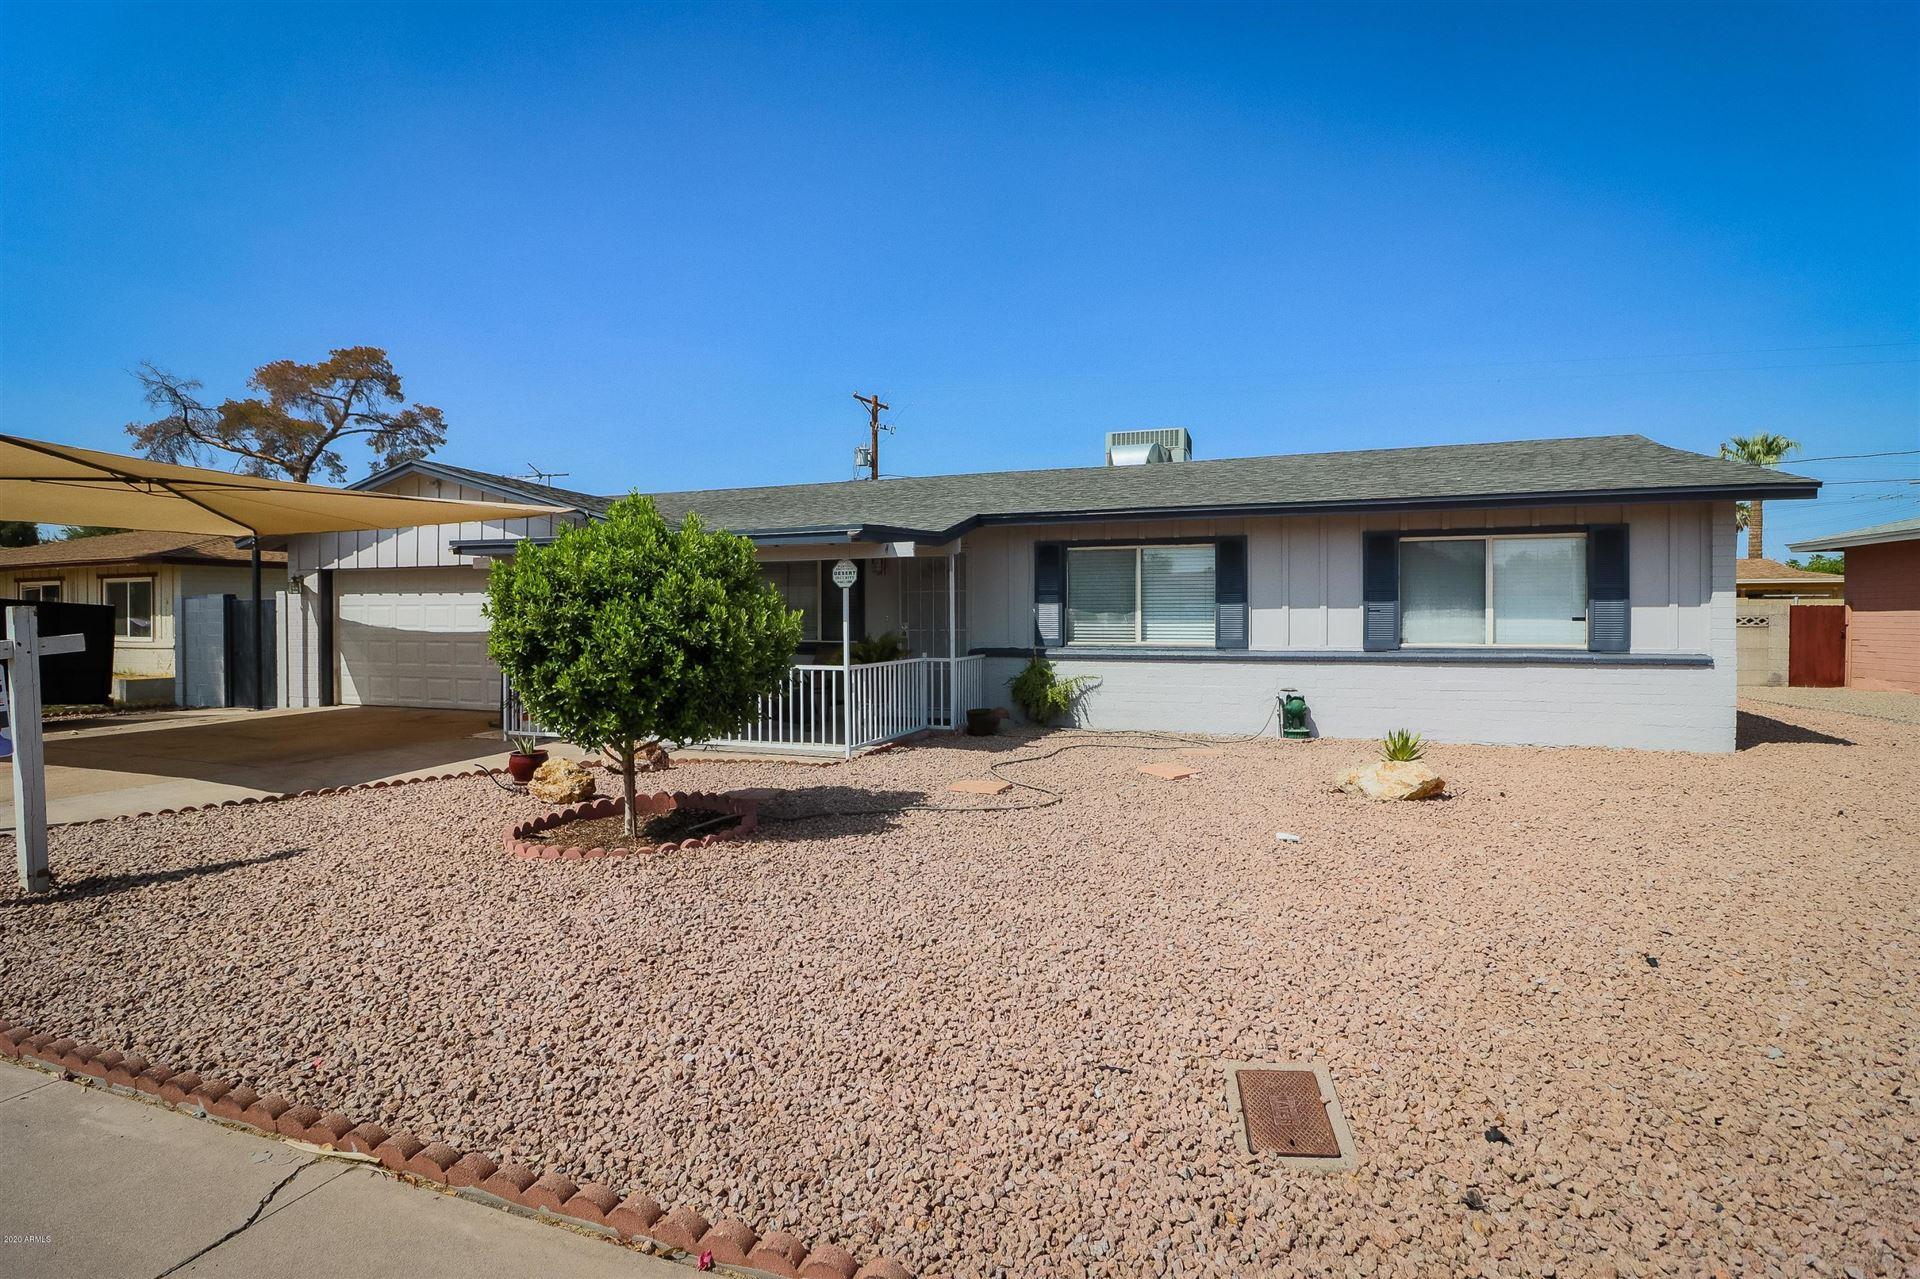 3912 W SOLAR Drive, Phoenix, AZ 85051 - MLS#: 6133425